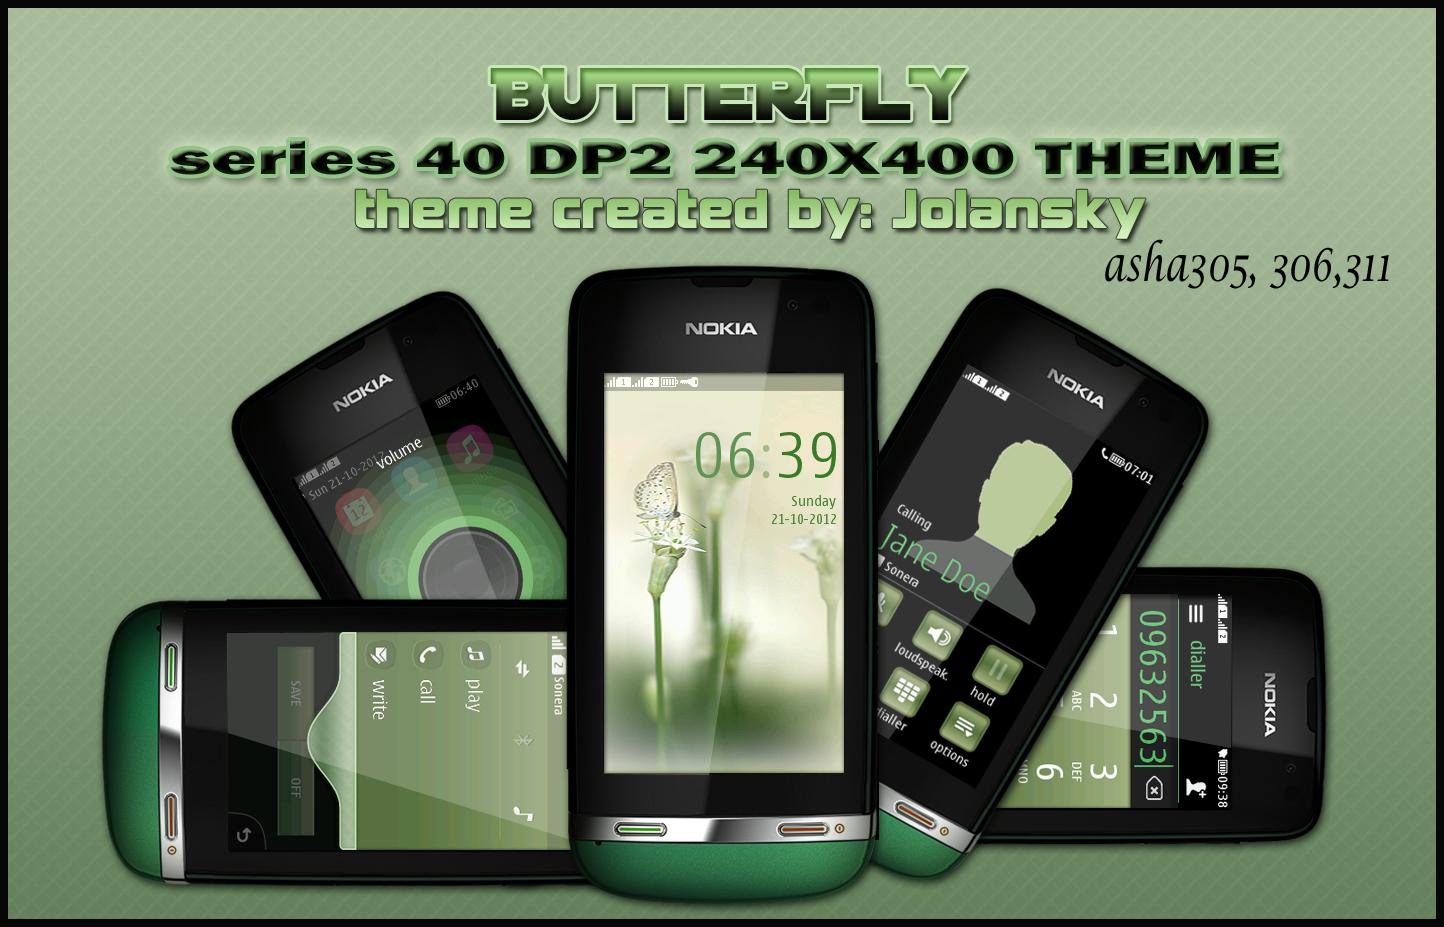 Nokia Asha 311 Blue Butterfly for nokia asha 305,